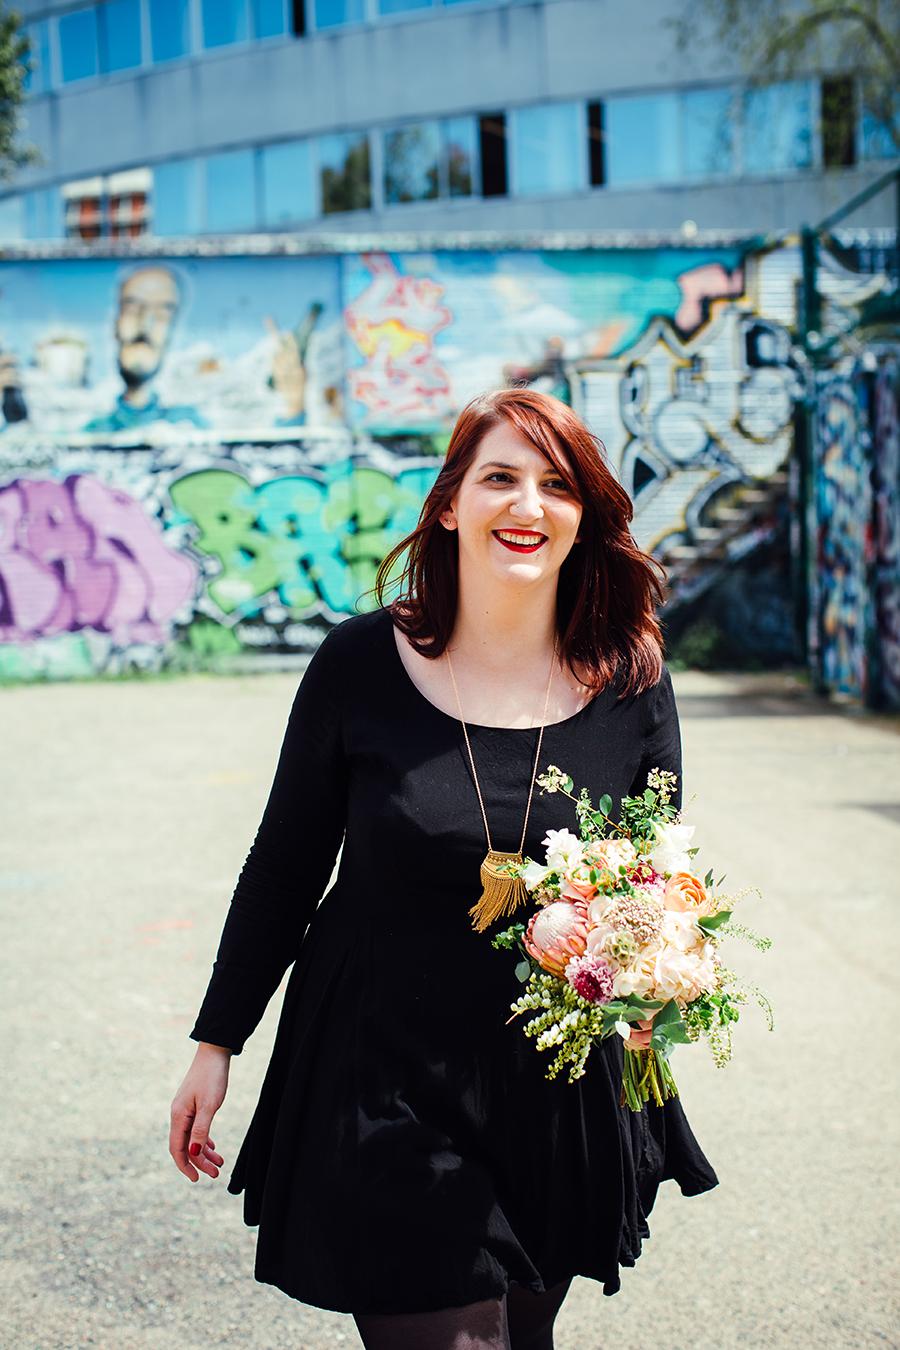 conseil-reussir-ses-photos-couple-mariage (37)